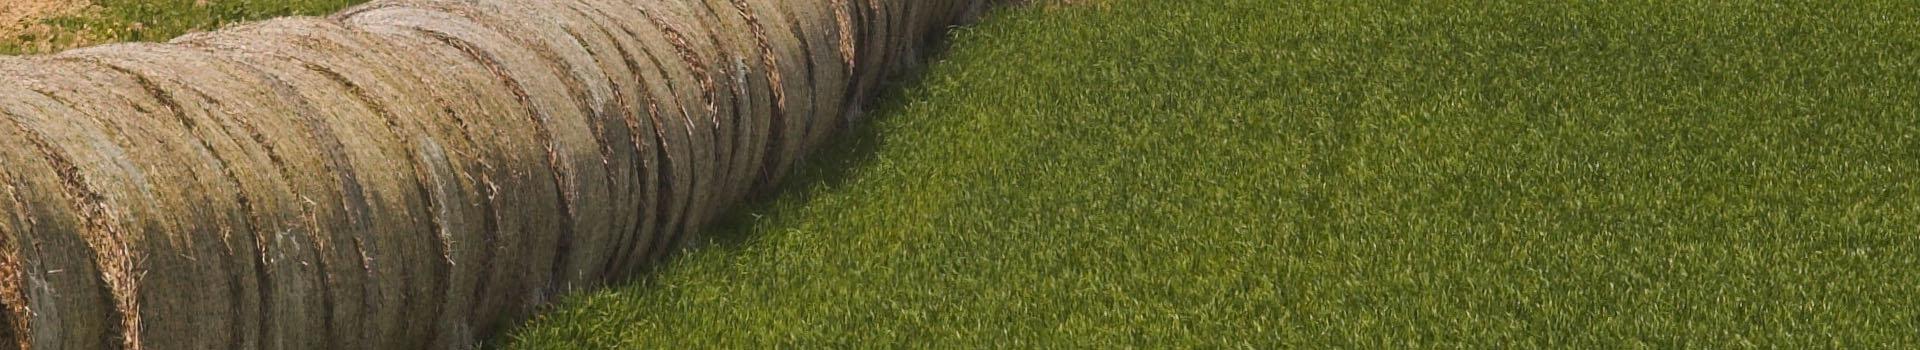 Biorefinery straw ethanol